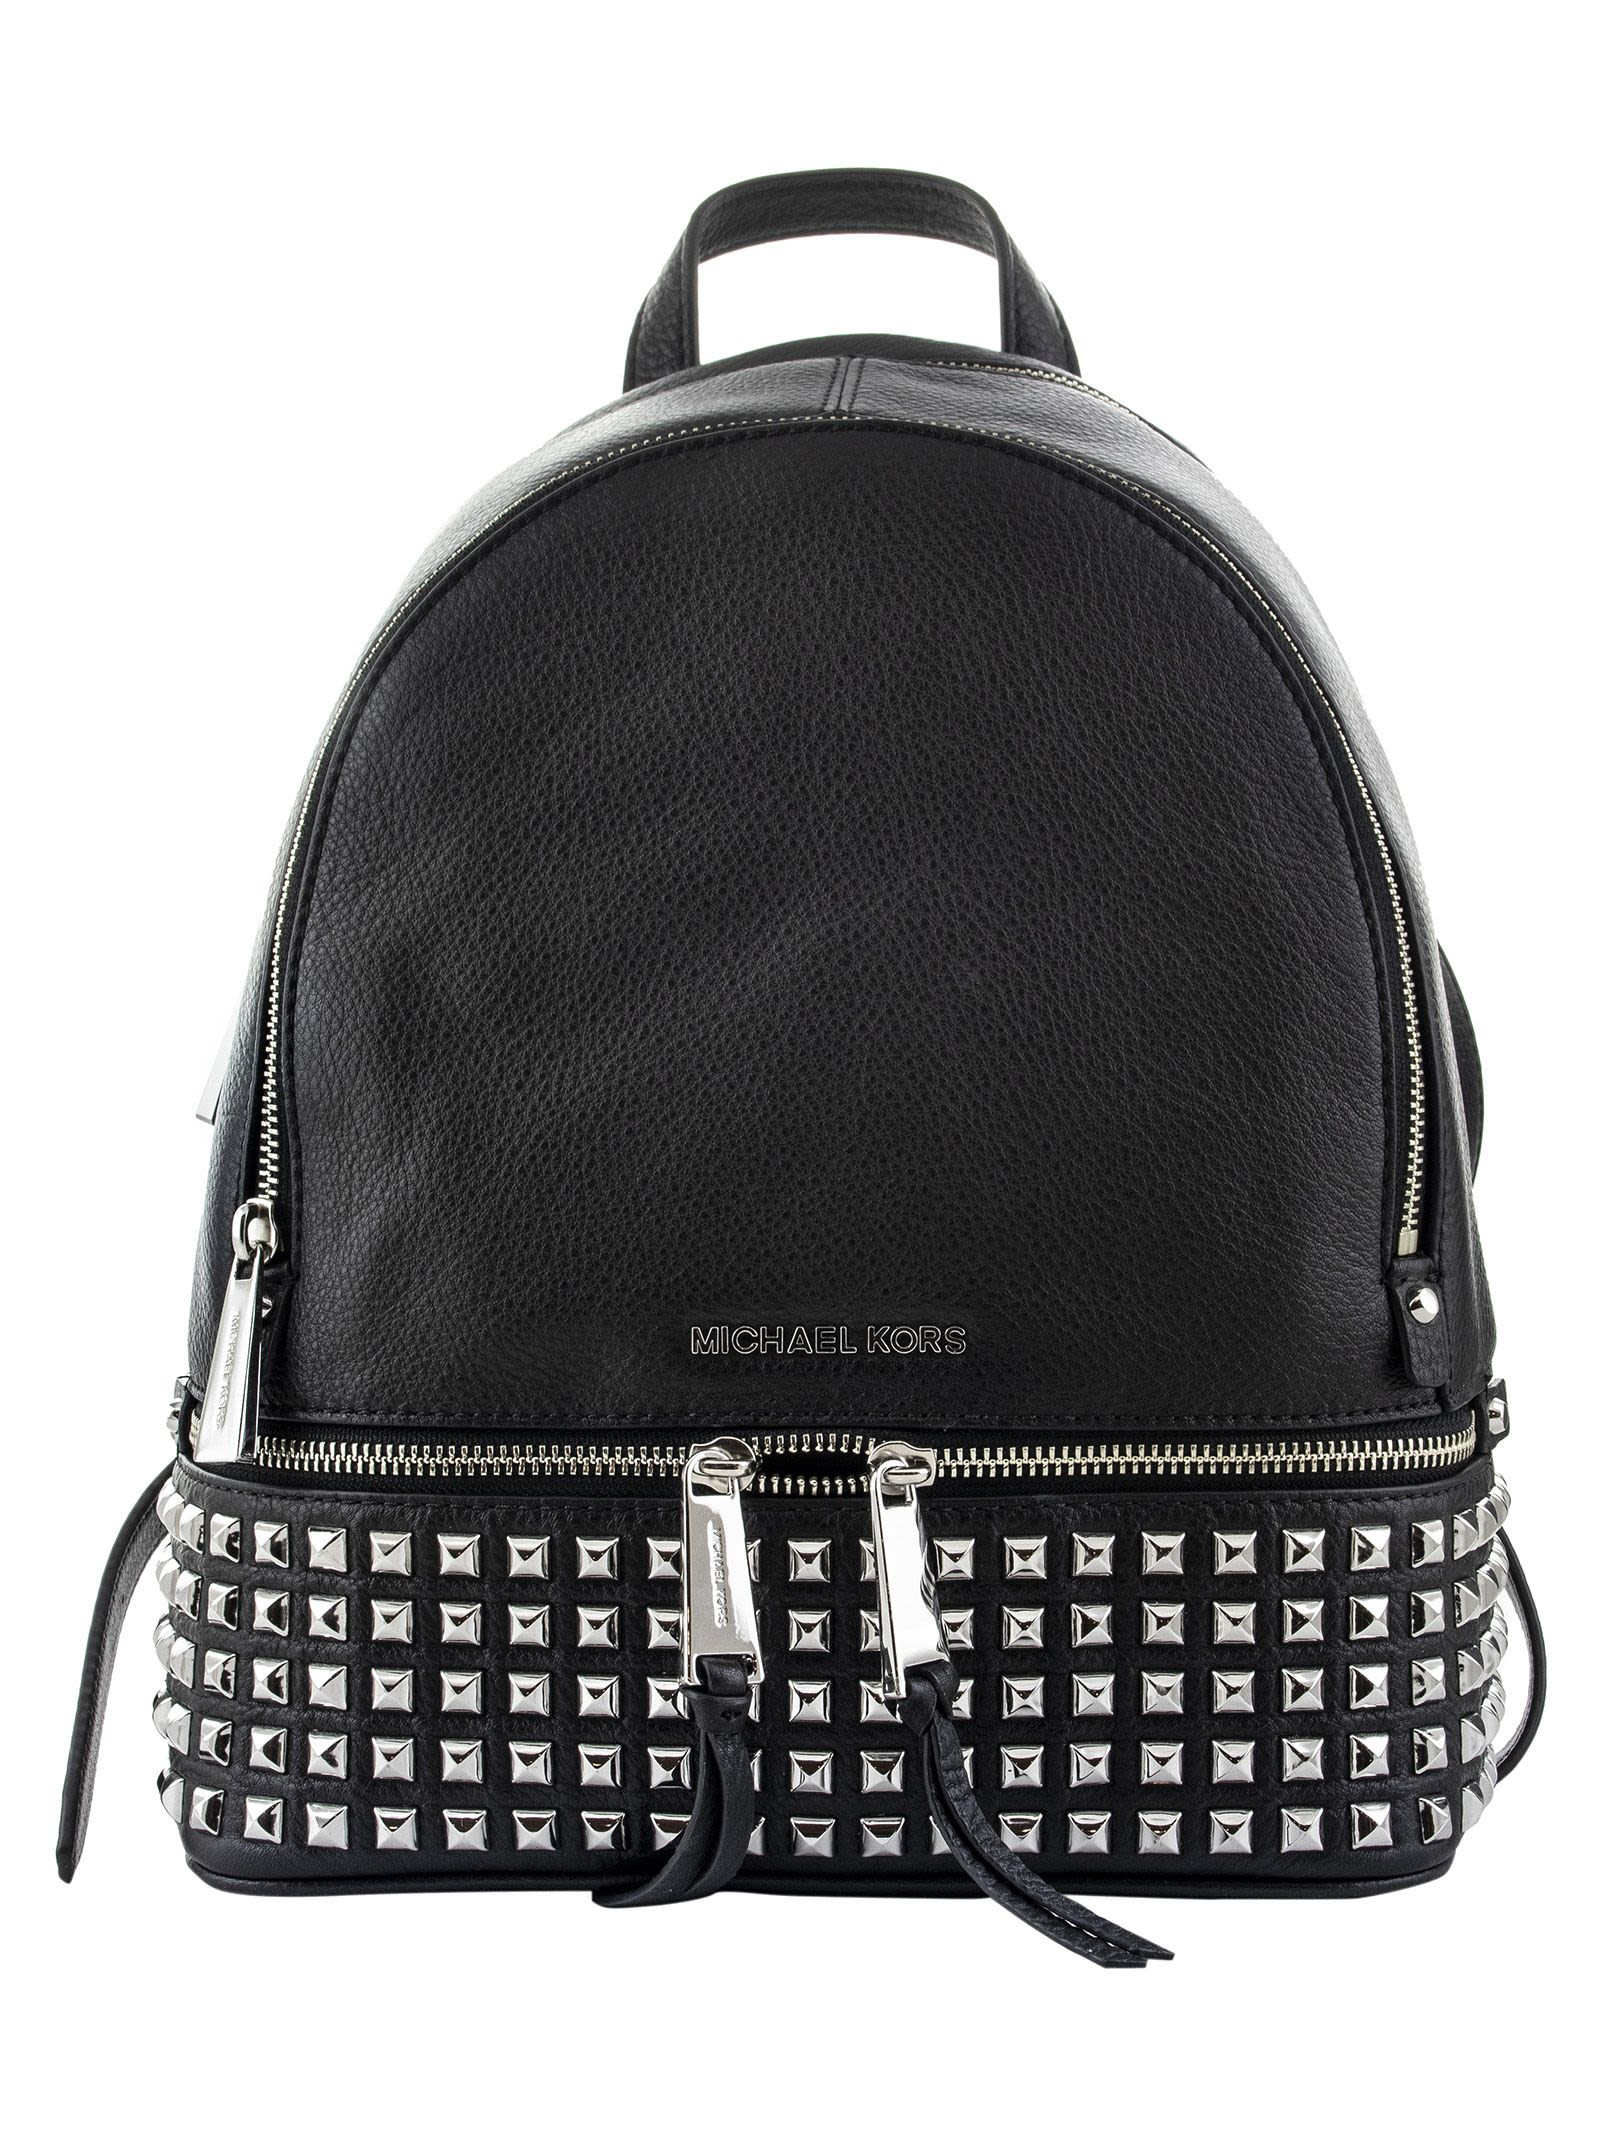 7370103c04d5 Michael Kors Michael Kors Logo Plaque Backpack - BLACK - 10853857 ...